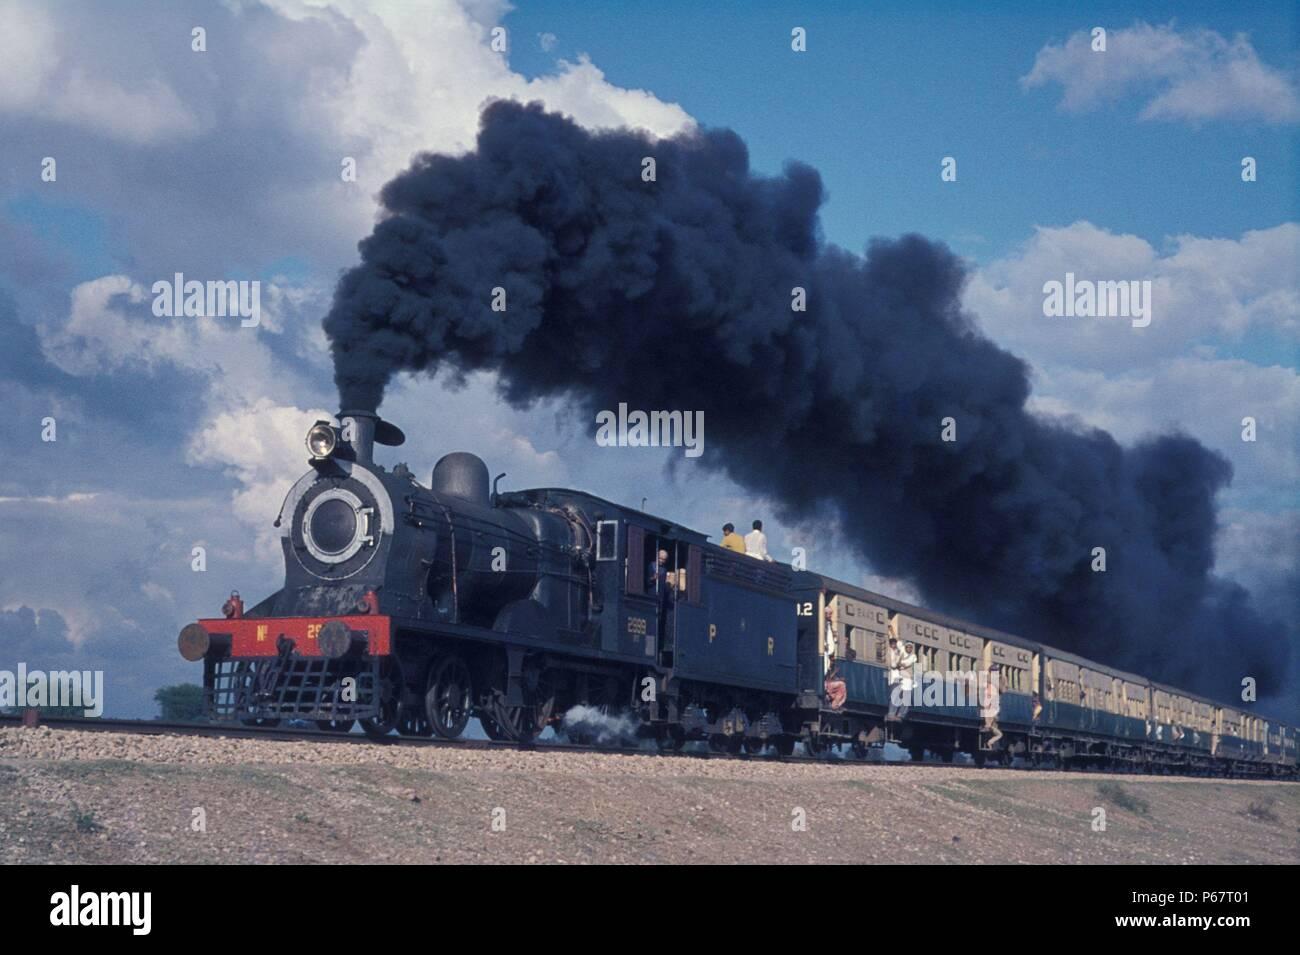 Pakistan Railways British built inside cylinder SPS class 4-4-0 No. 2999 freshly overhauled at Moghulpura Works Lahore leaves Malakwal for Sargodha wi - Stock Image